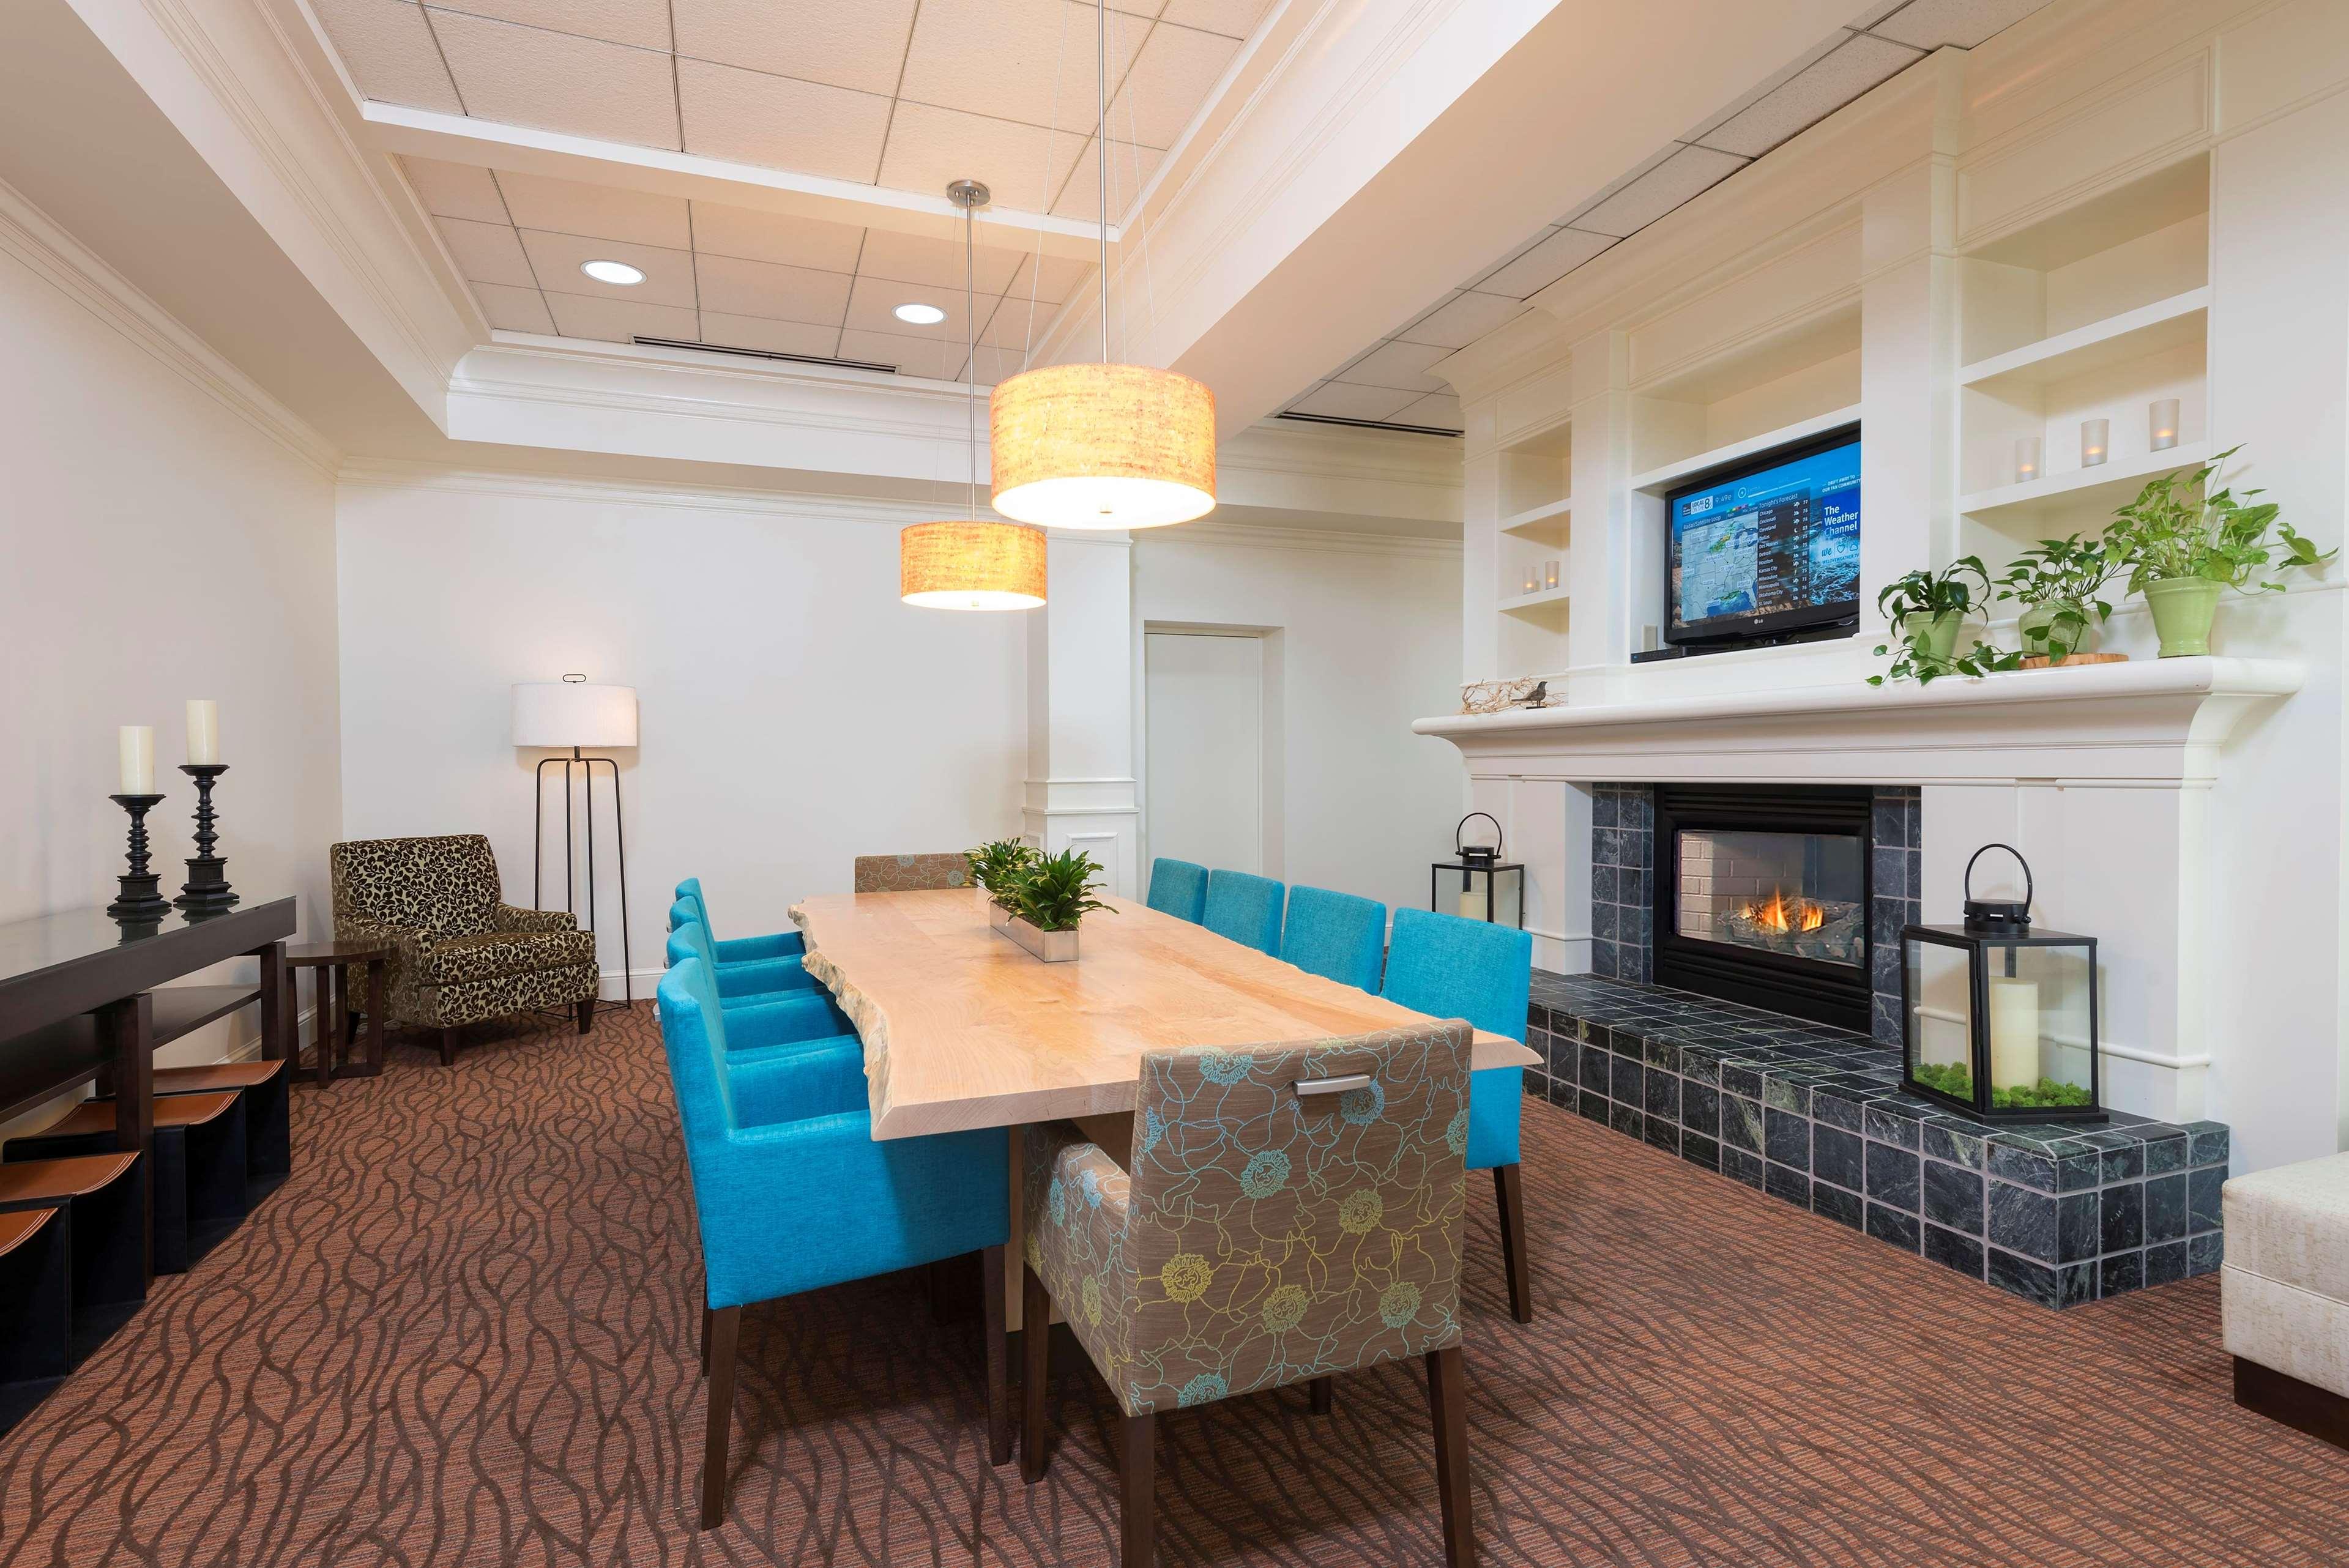 Hilton garden inn west lafayette wabash landing in west lafayette in 47906 for Hilton garden inn west lafayette